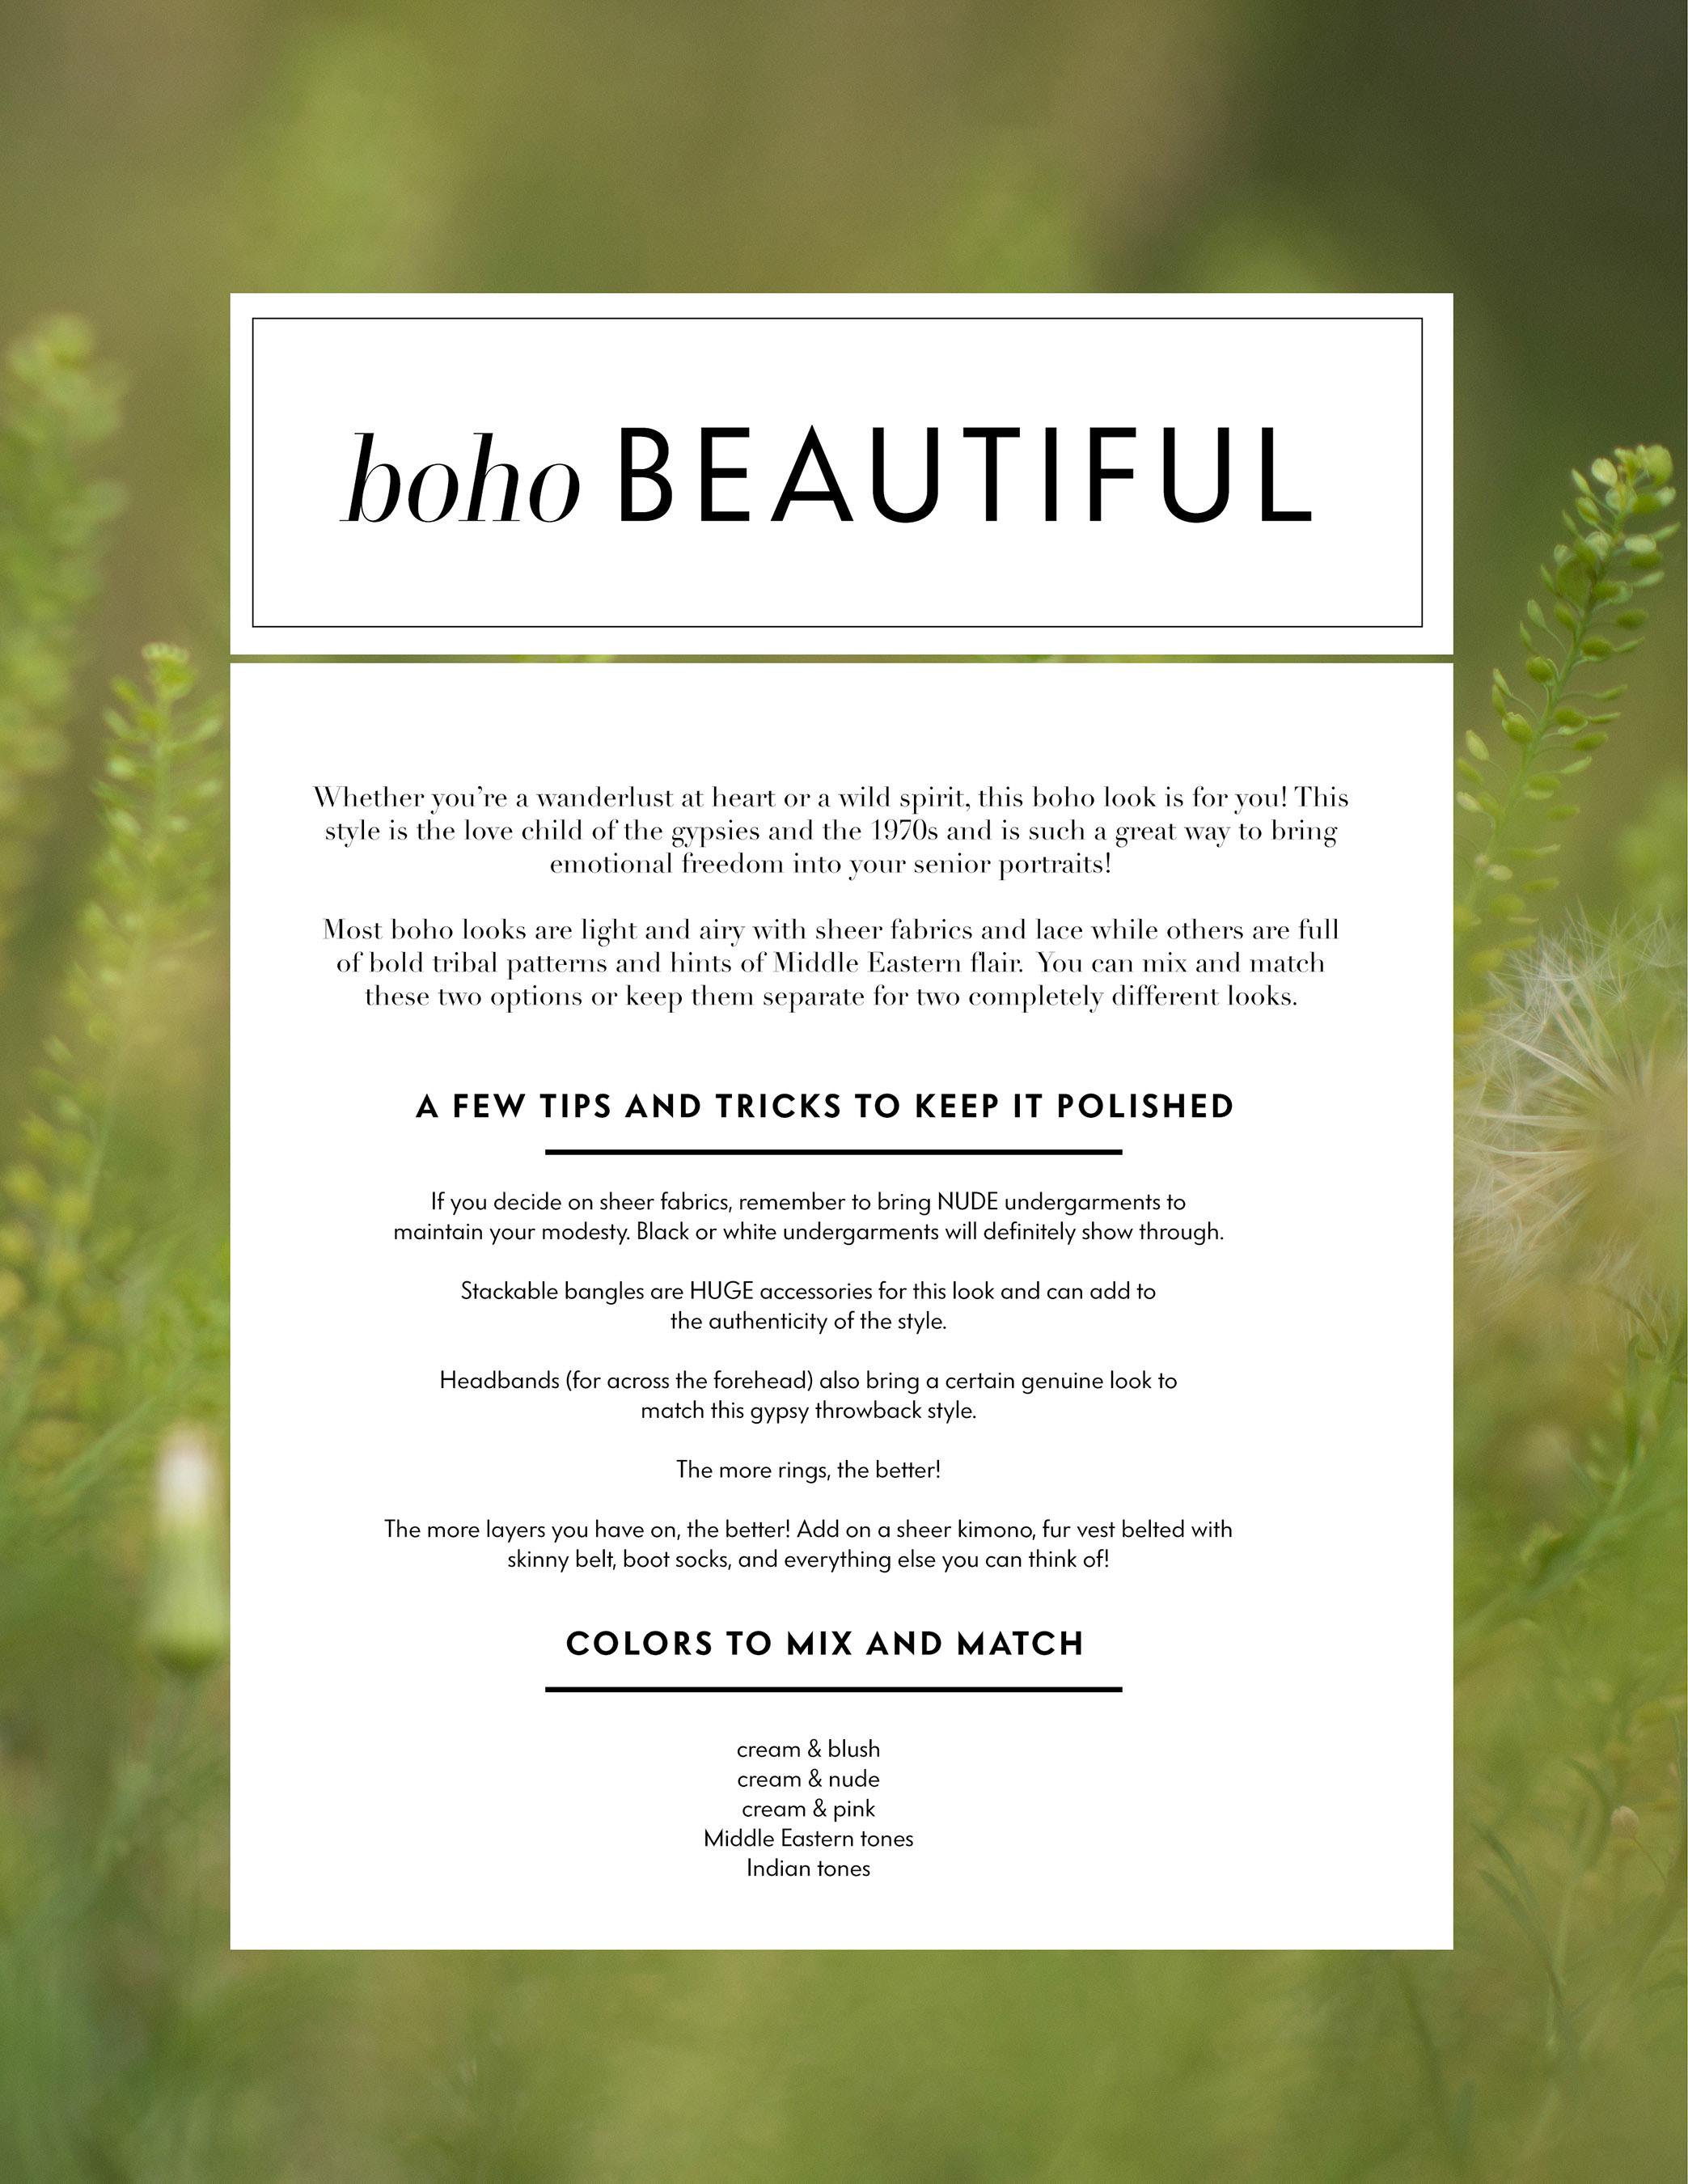 What to Wear Guide - Digital PDF-28-Left.jpg